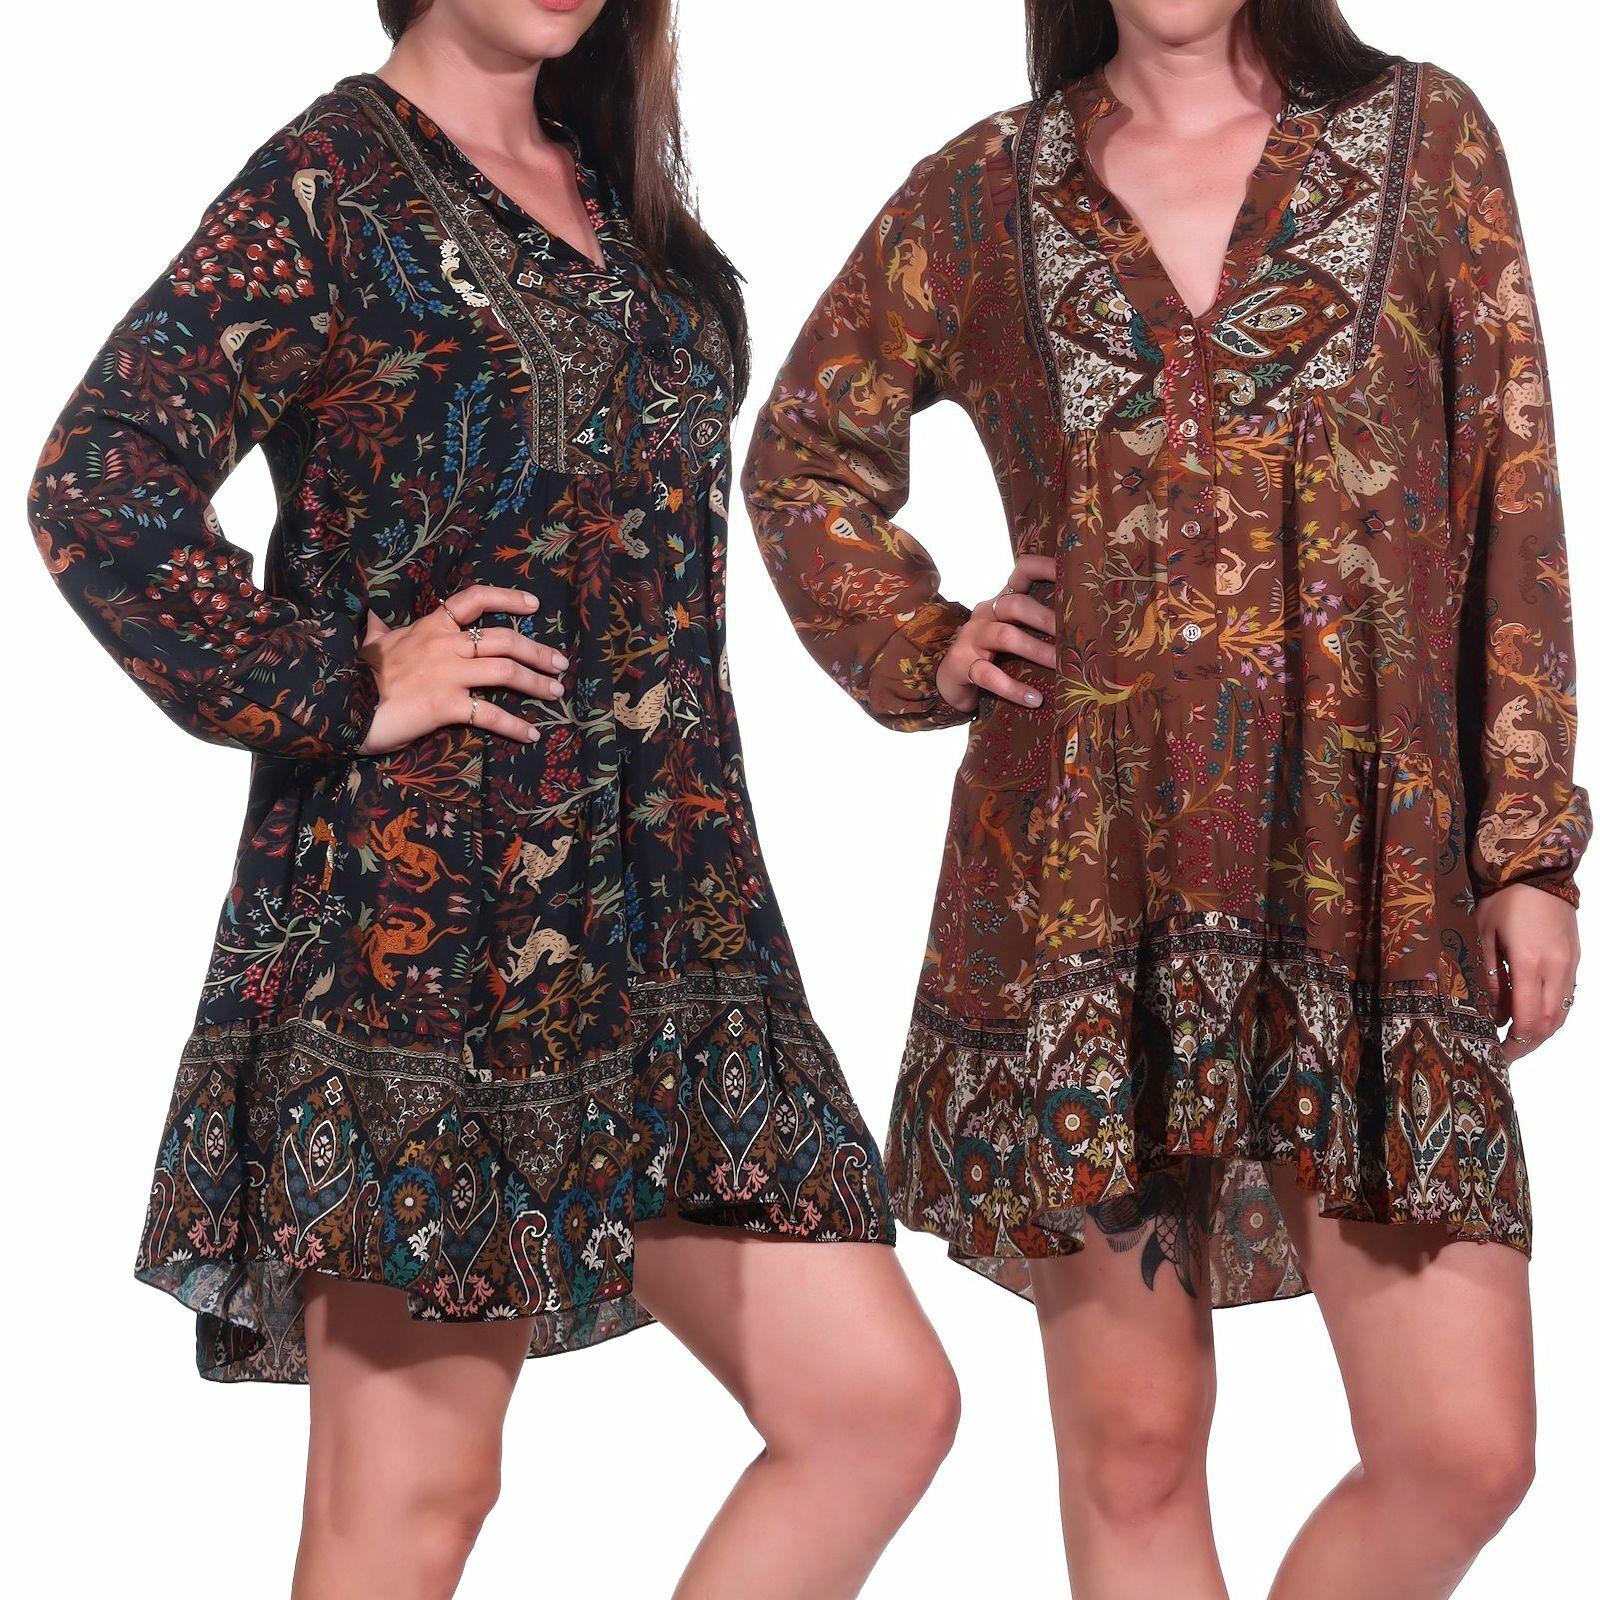 Ladies Dress Womens Dress bohokleid Mini Dress Boho Tunic 100% VISCOSE Hailys Ona